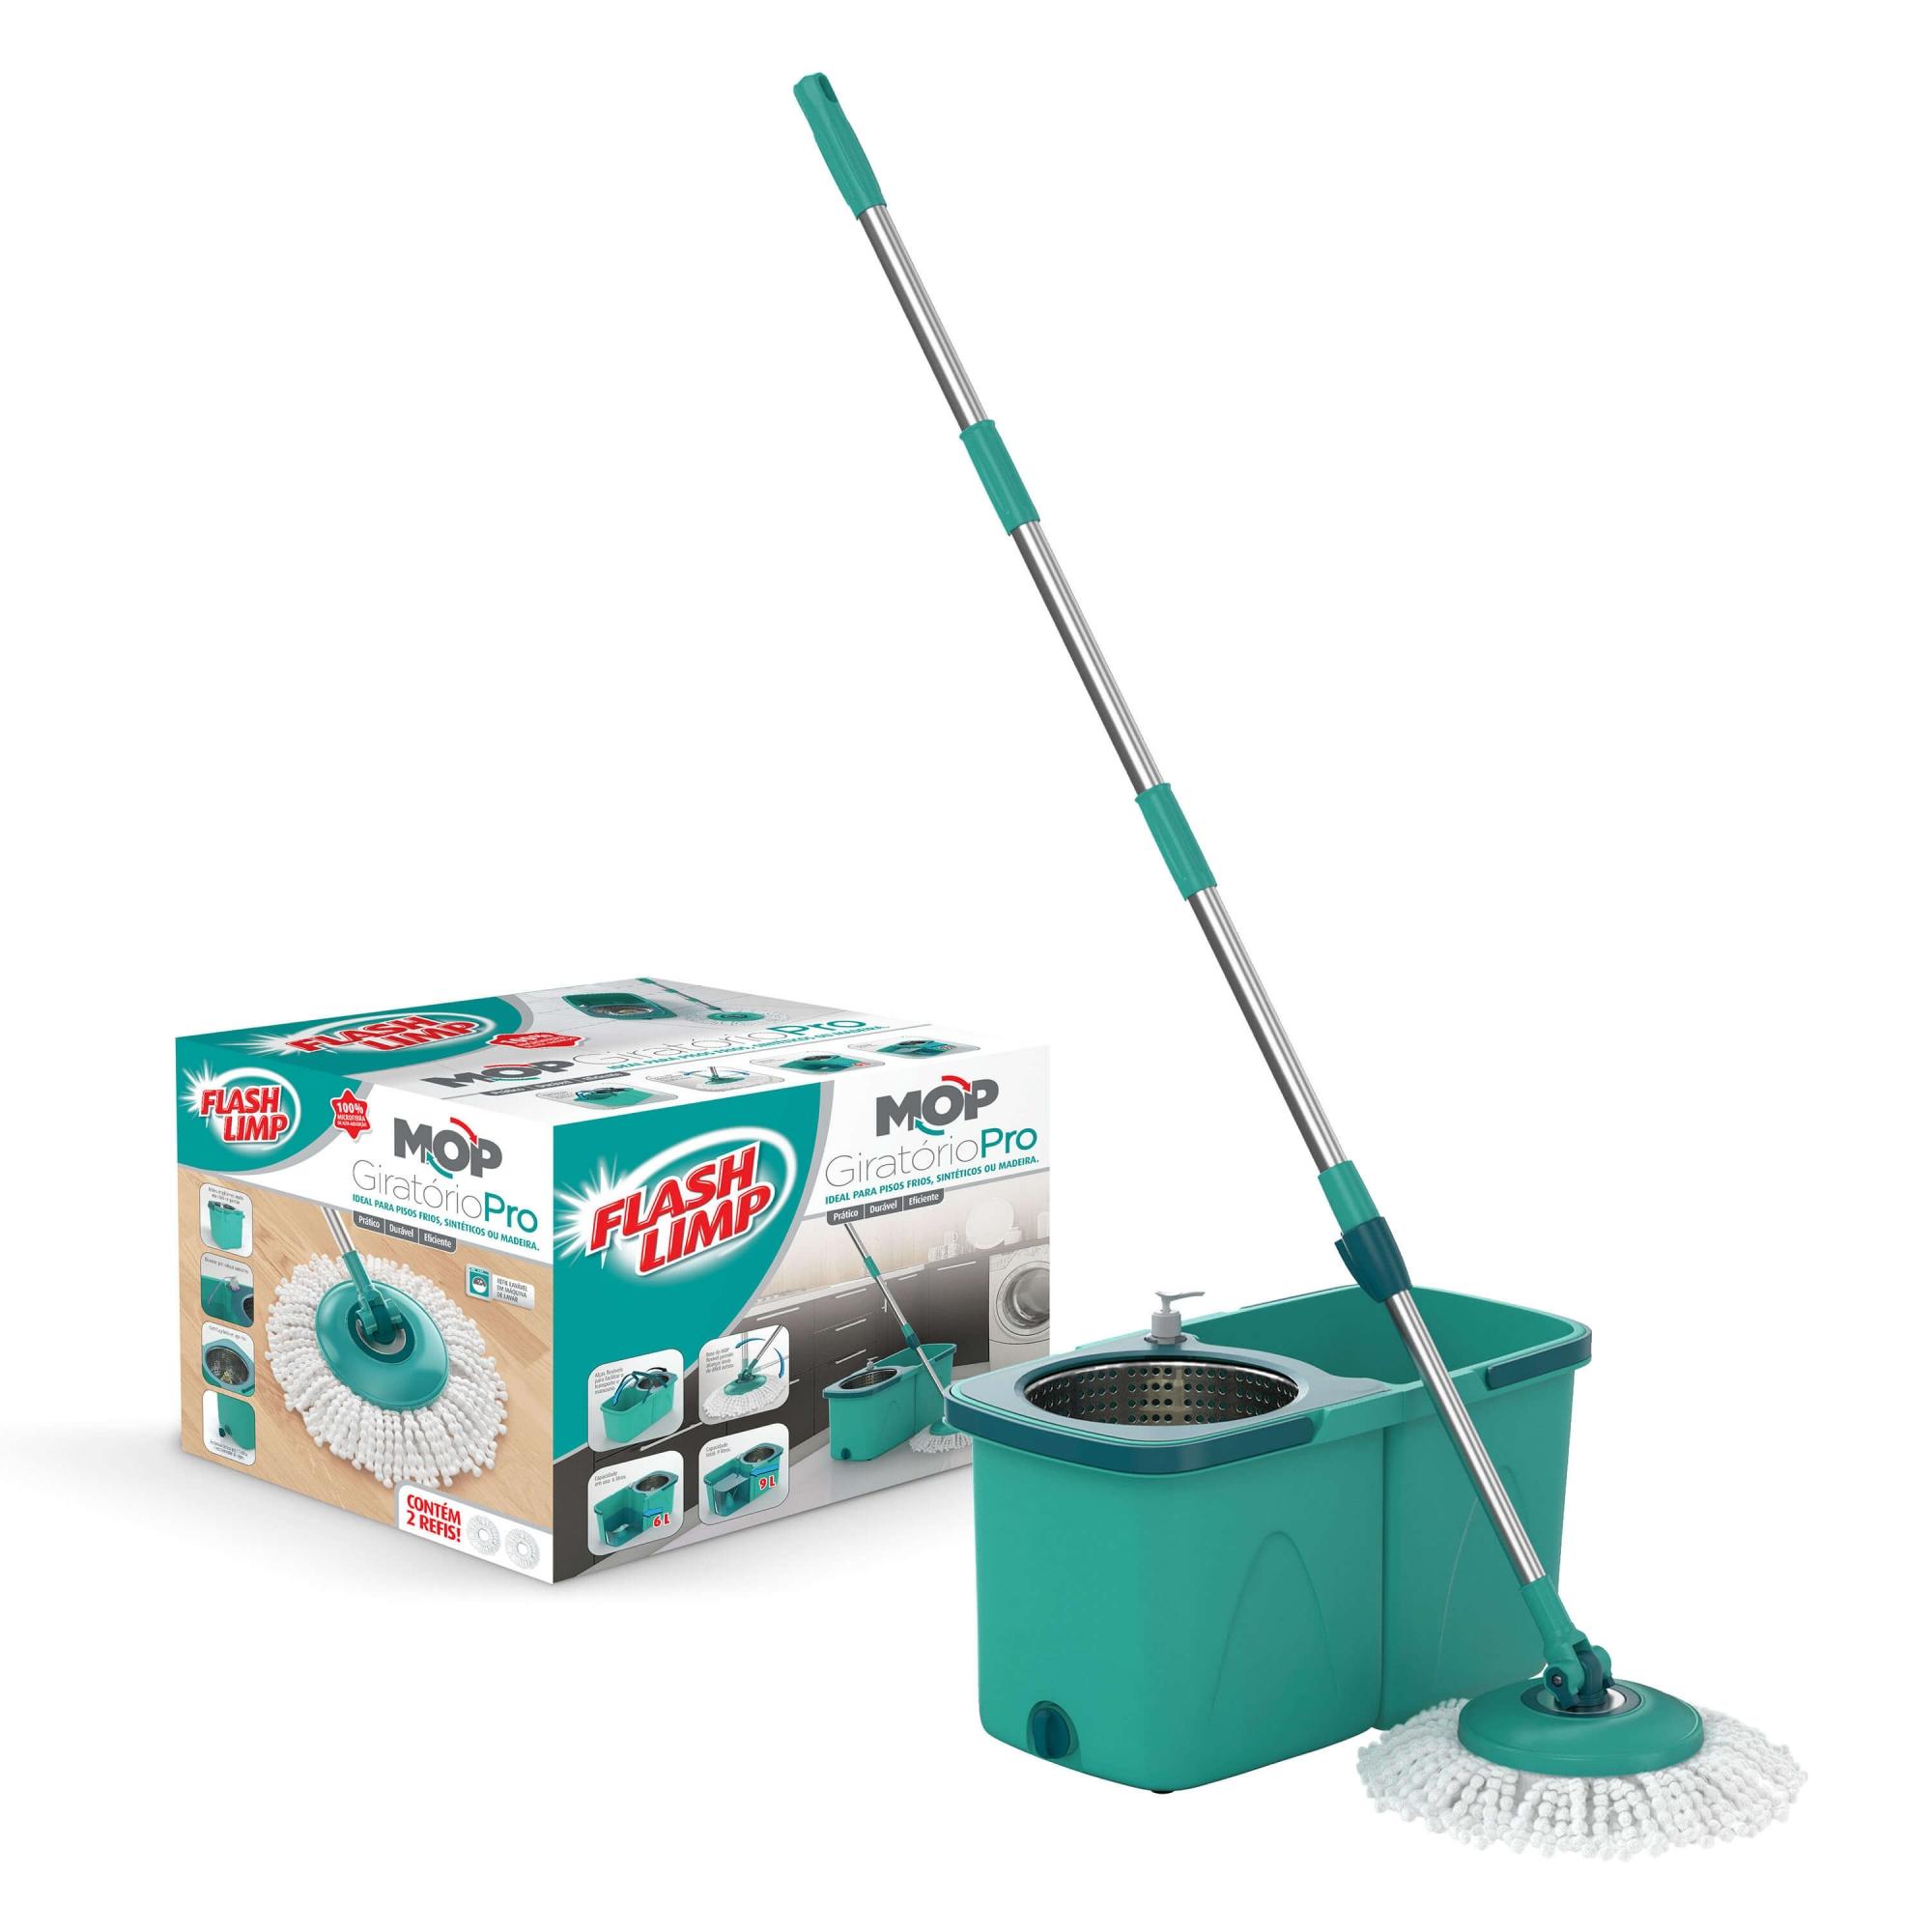 Mop Giratório Pro - Flash Limp  - Pensou Filtros